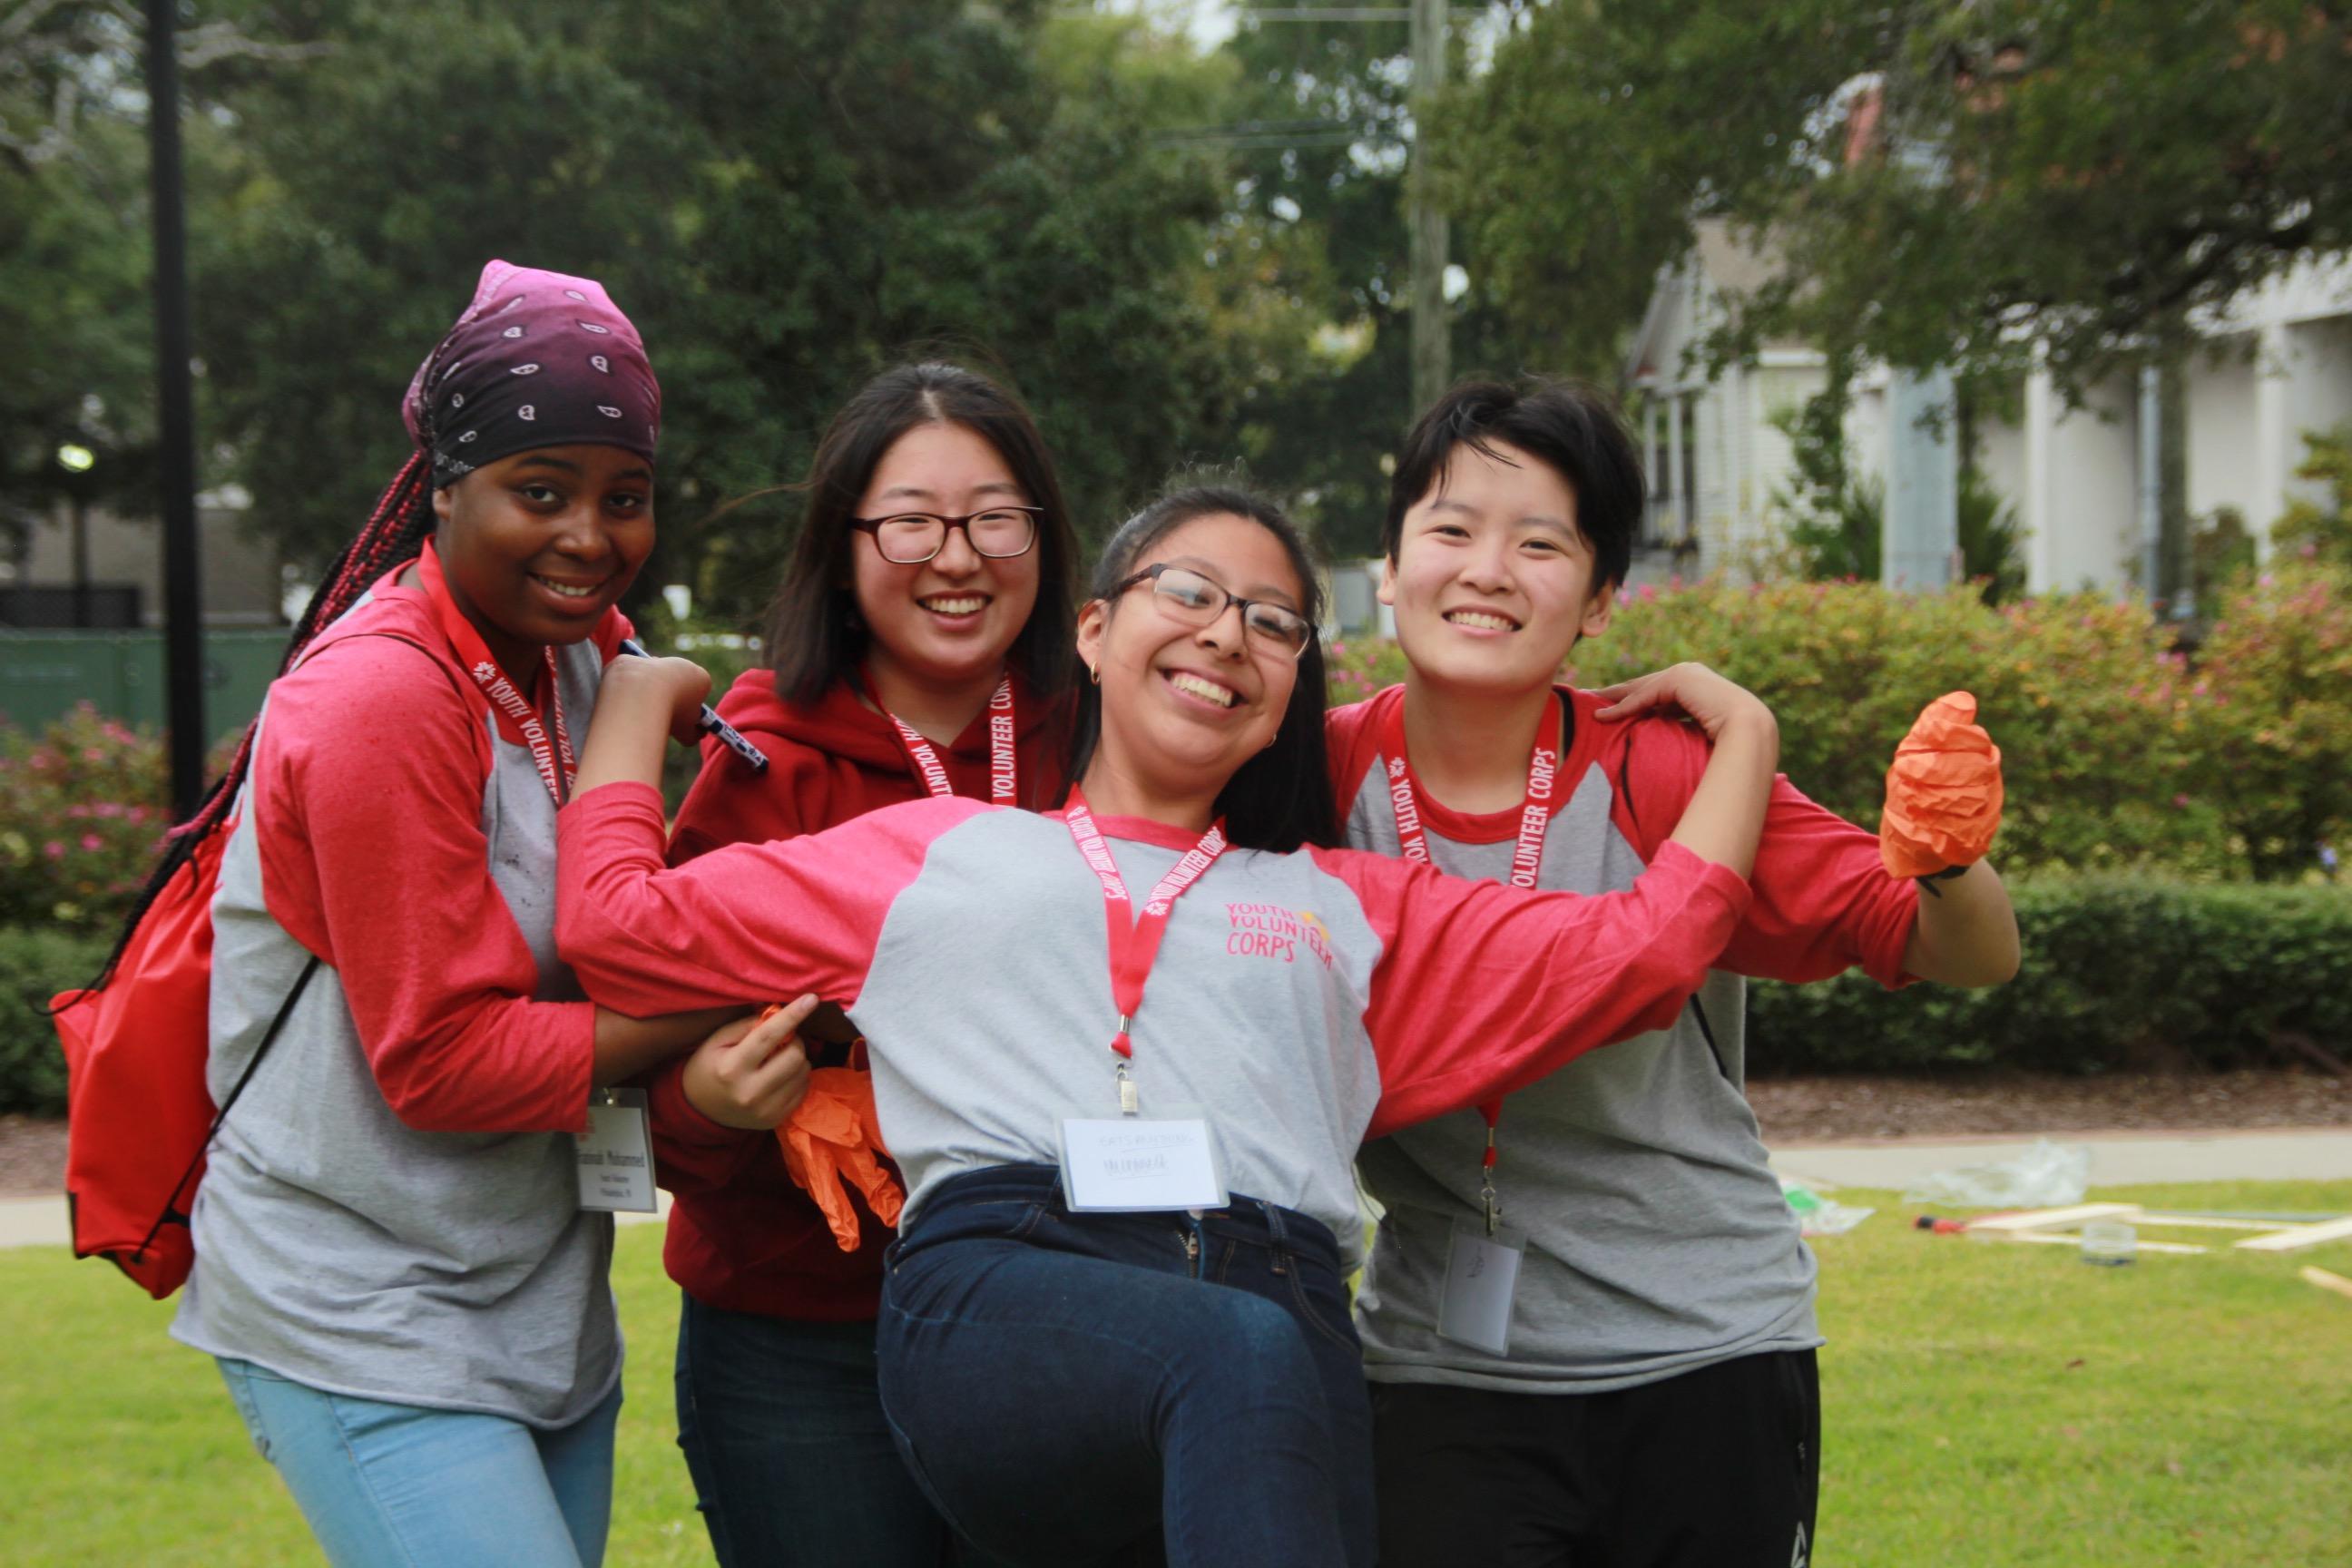 Mental Health Benefits of Volunteering